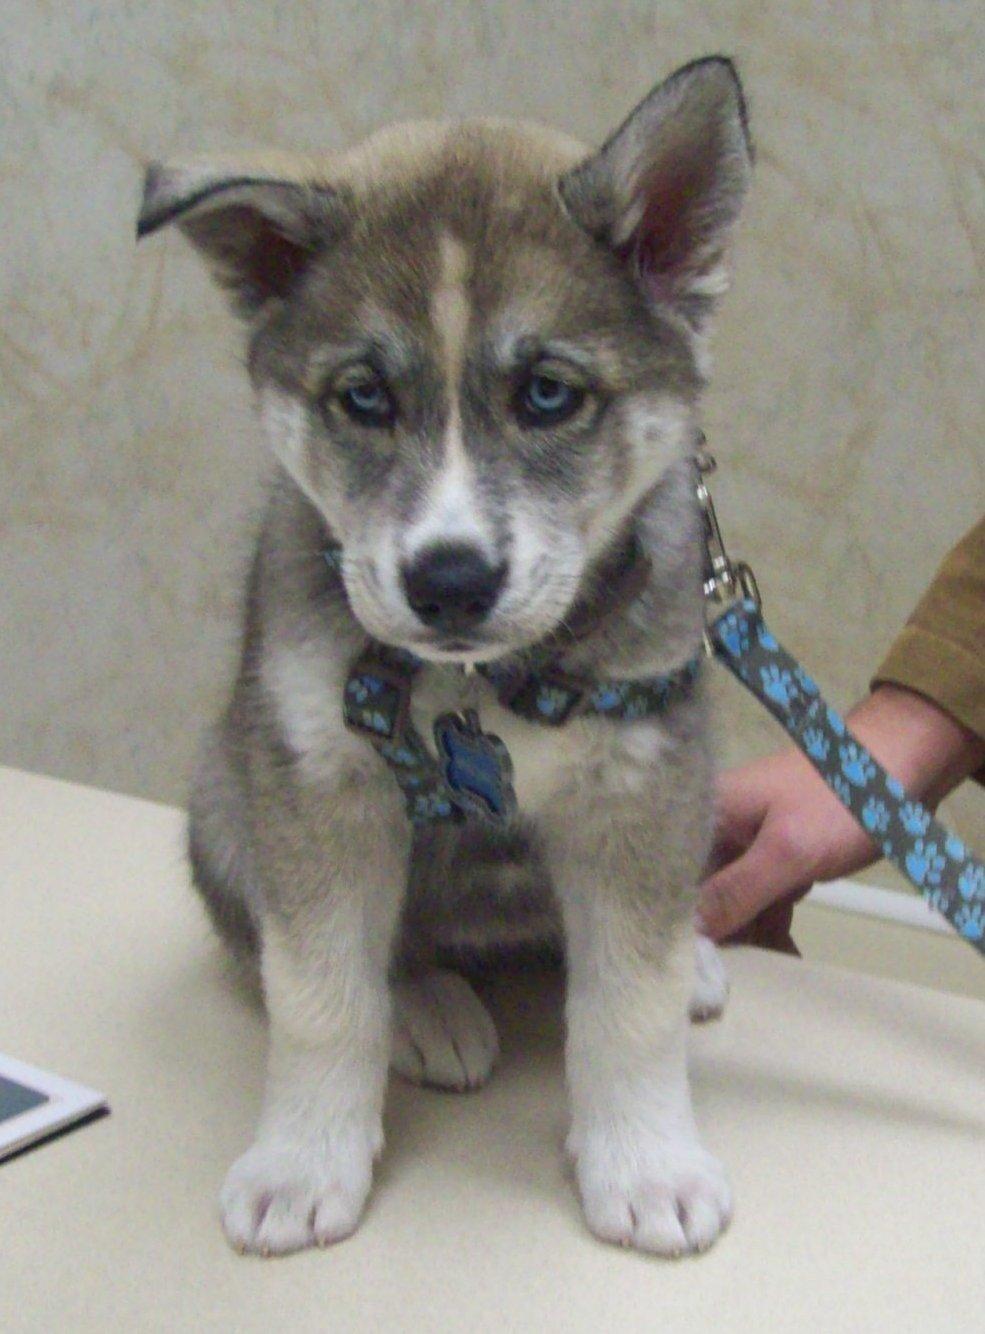 Wolf husky mix puppies - photo#23